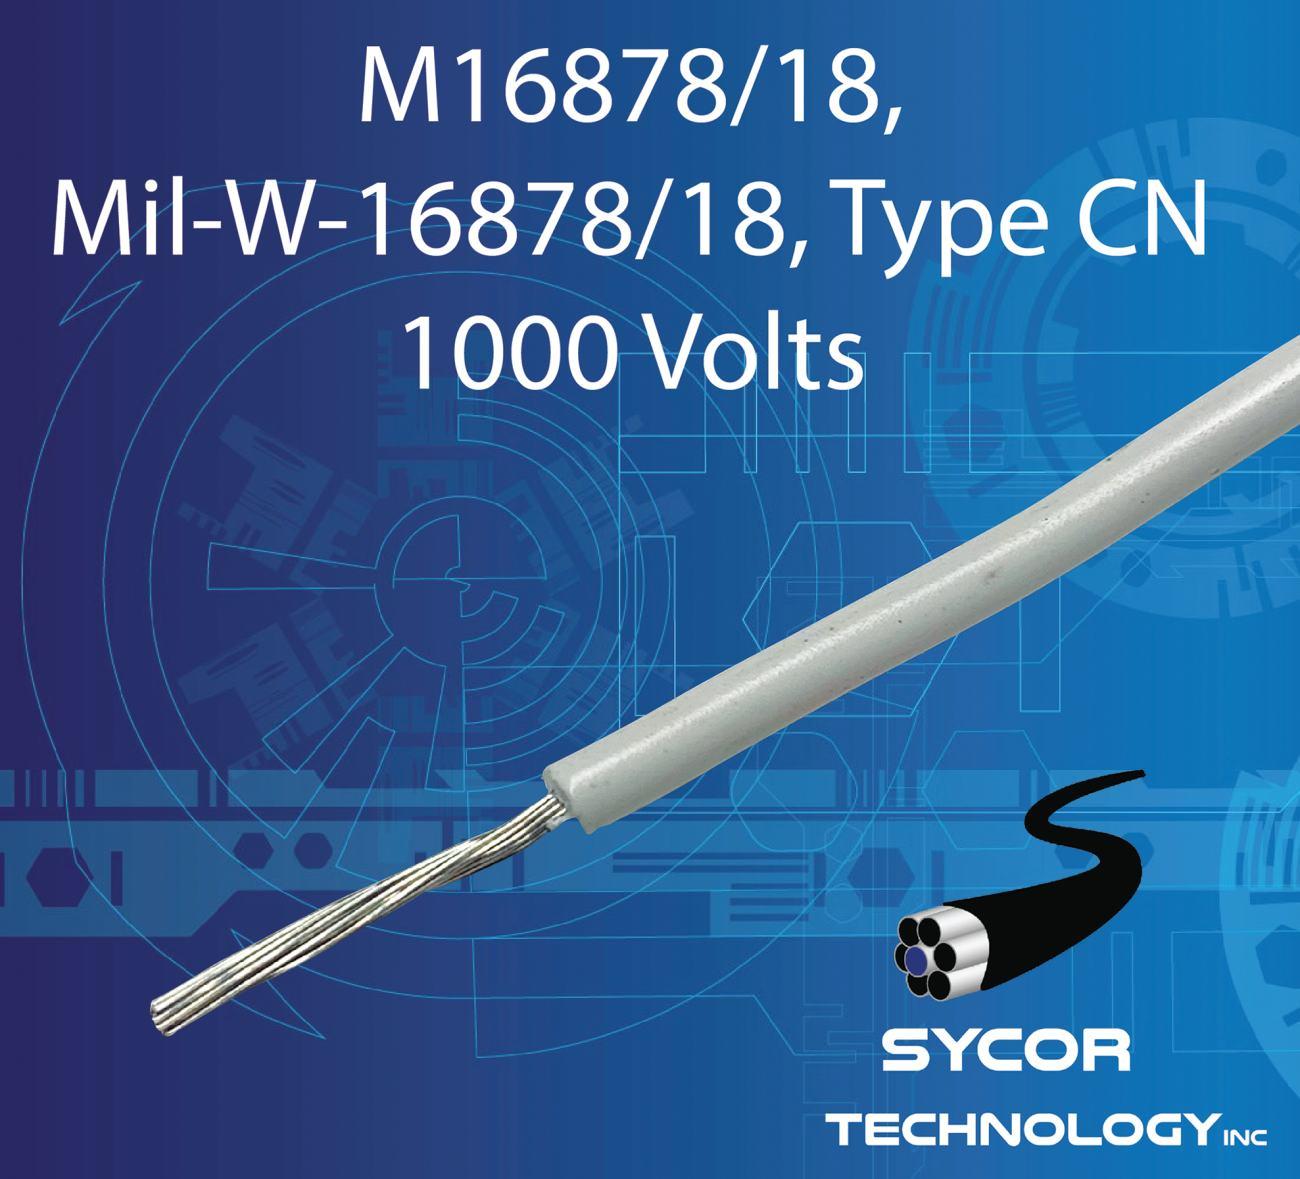 M16878/18, MIL-W-16878/18, Type CN